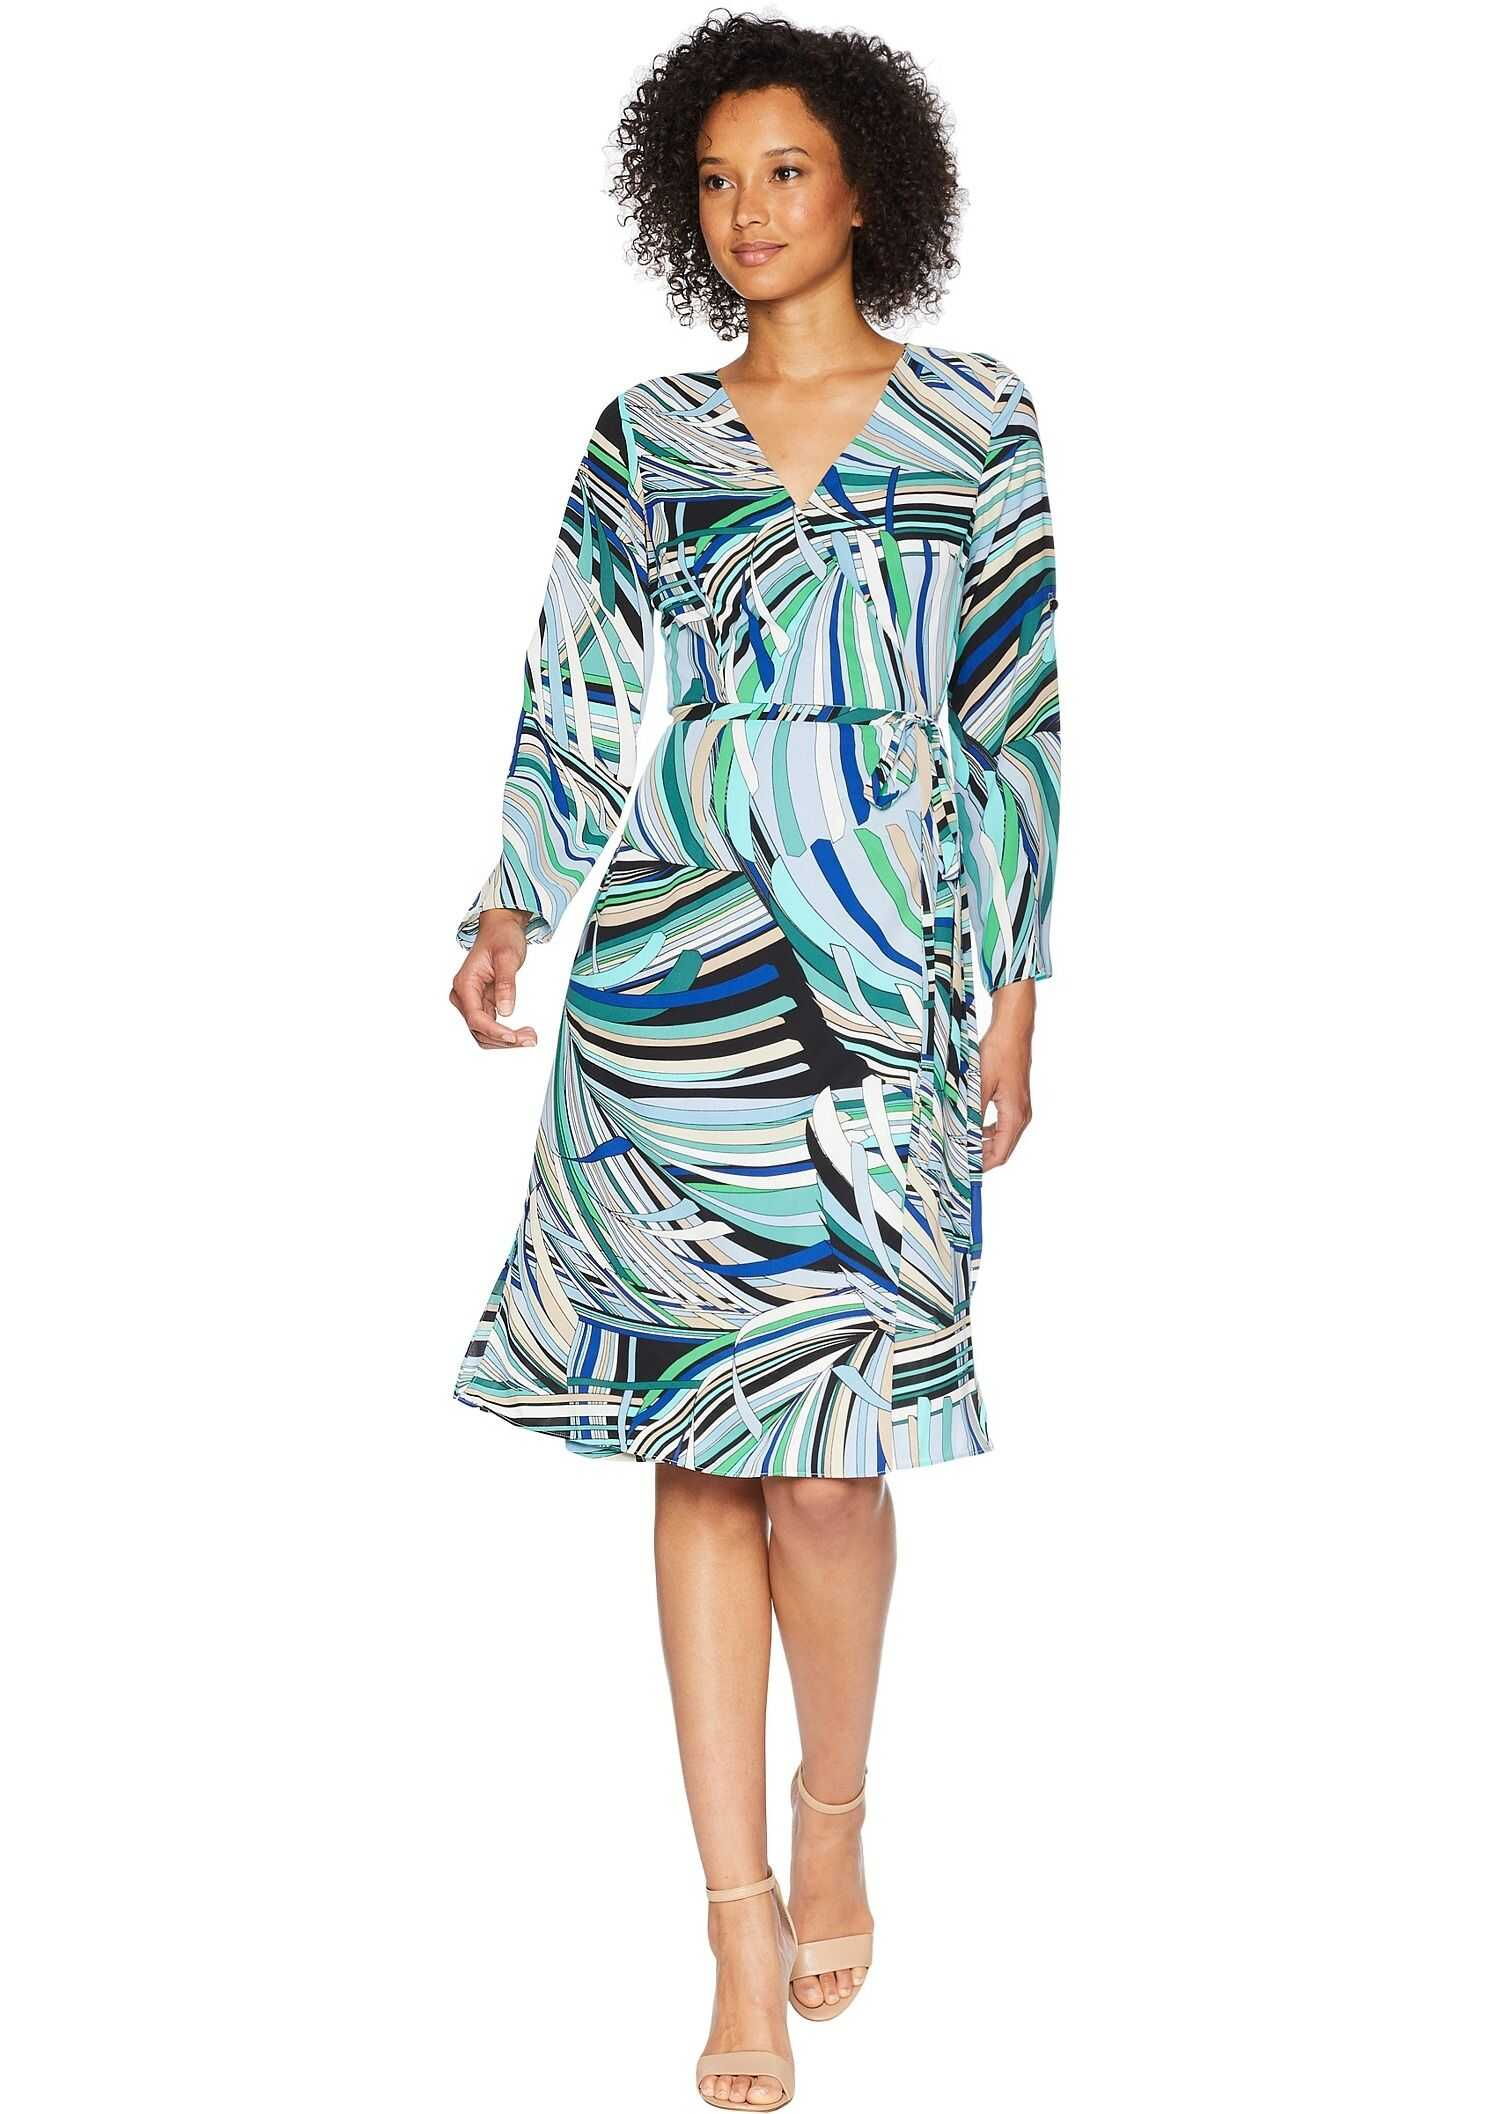 Adrianna Papell Emilio Maze Midi Wrap Dress Blue/Green Multi